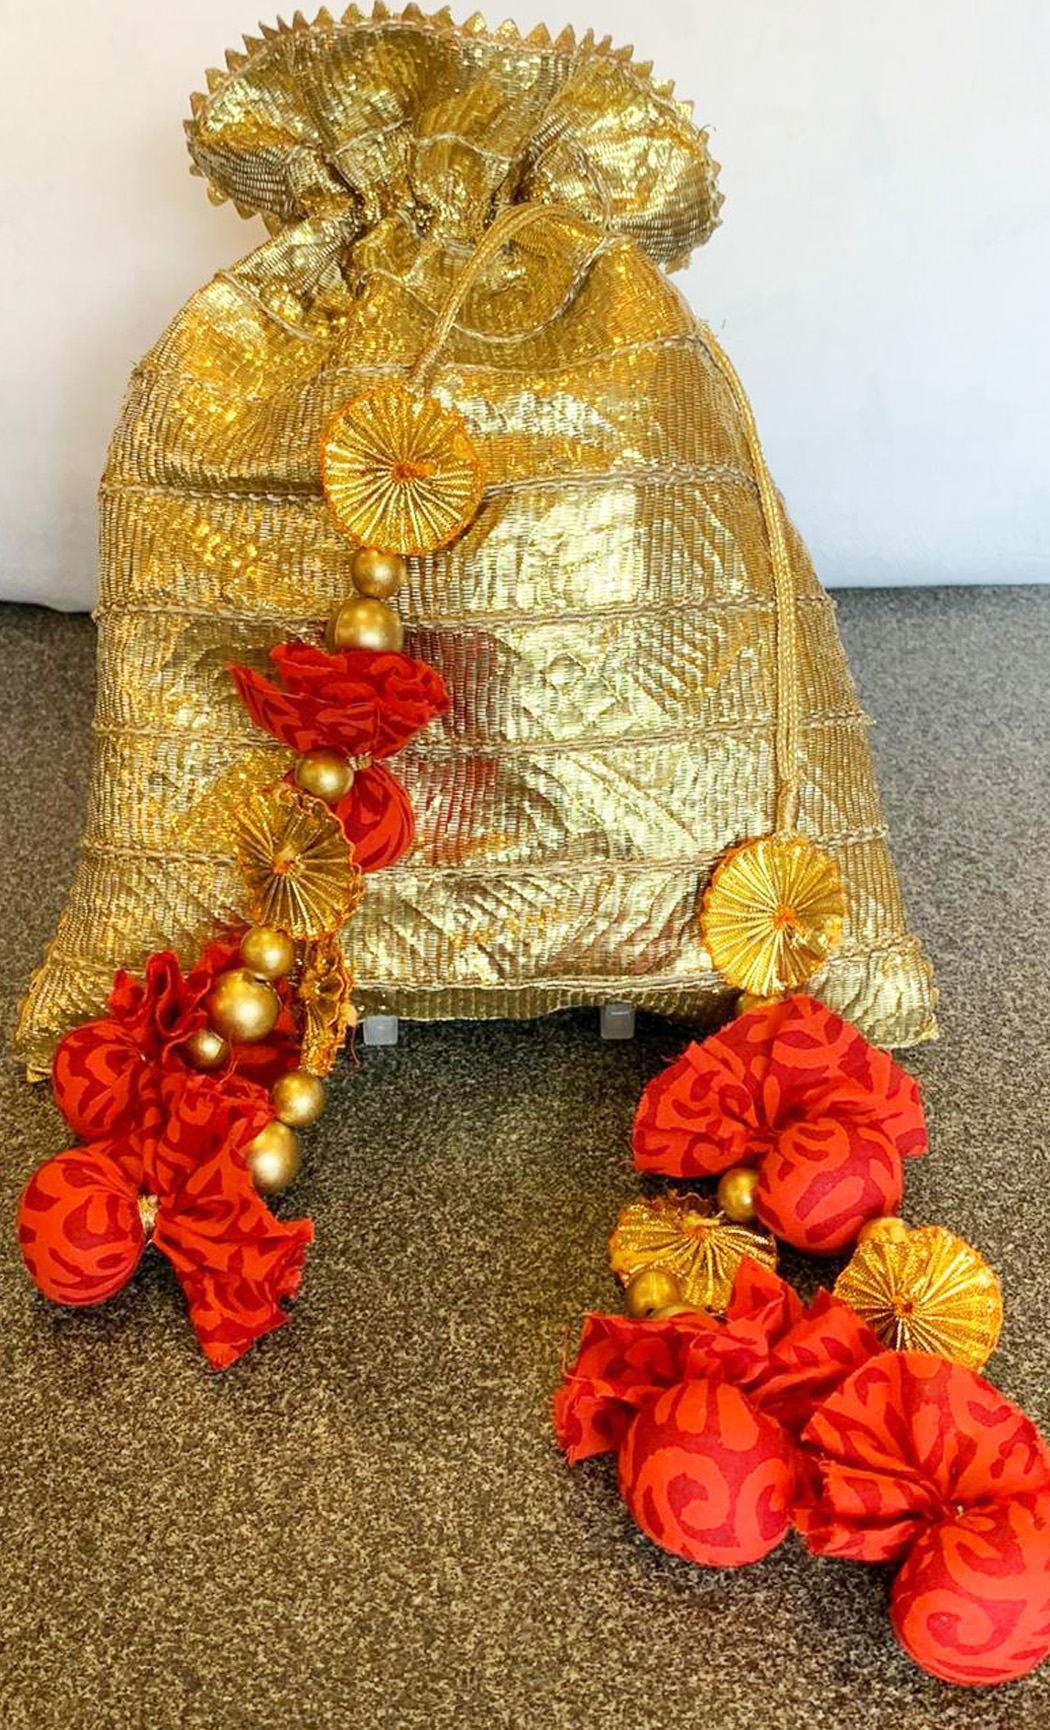 Gold Potli with Batik PomPoms - Buy Online